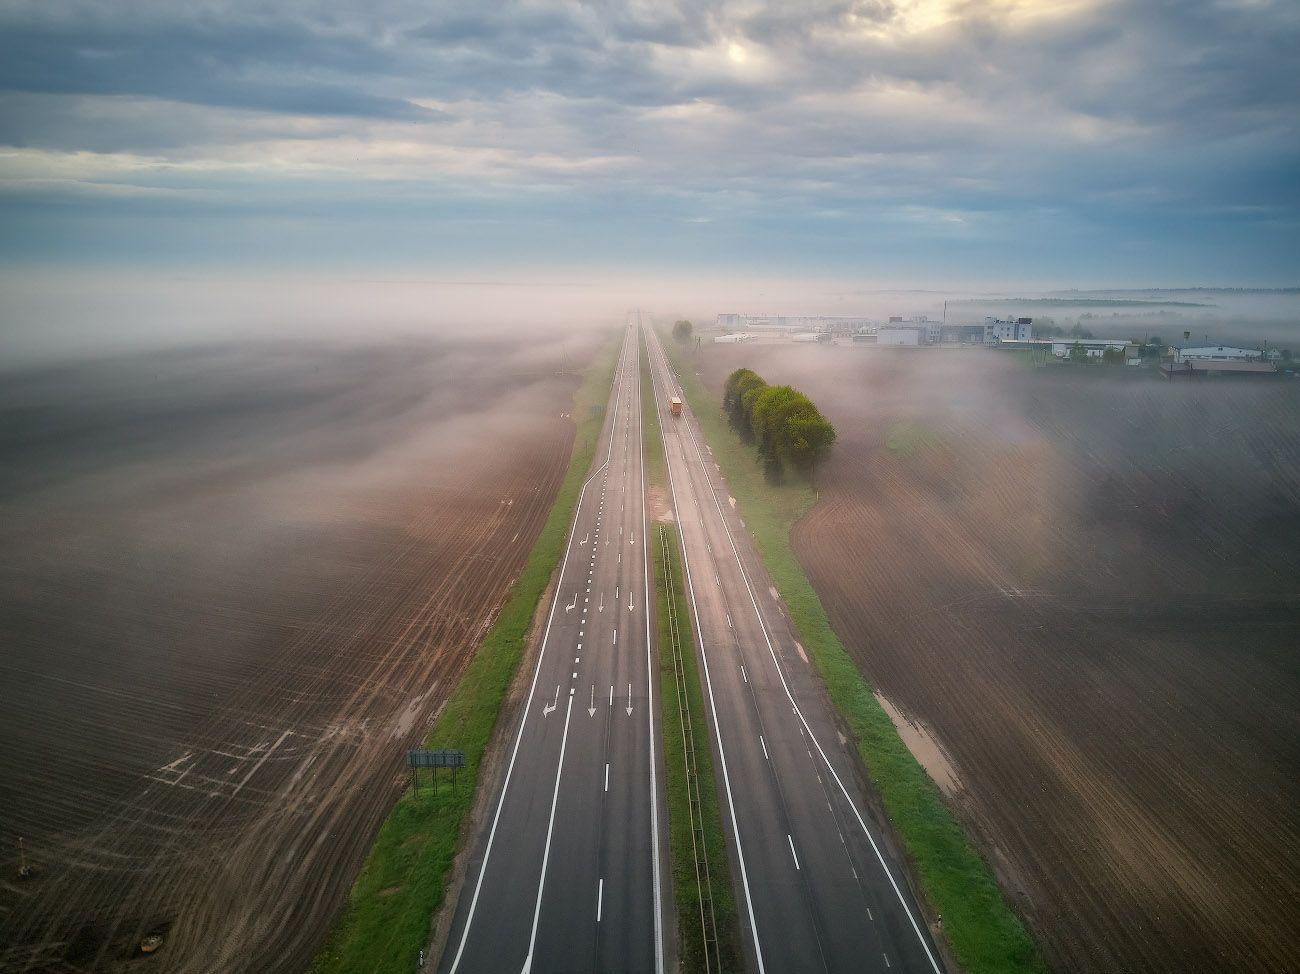 Уходя в туман Беларусь Весна Дождь Дорога Май Рассвет Туман Утро